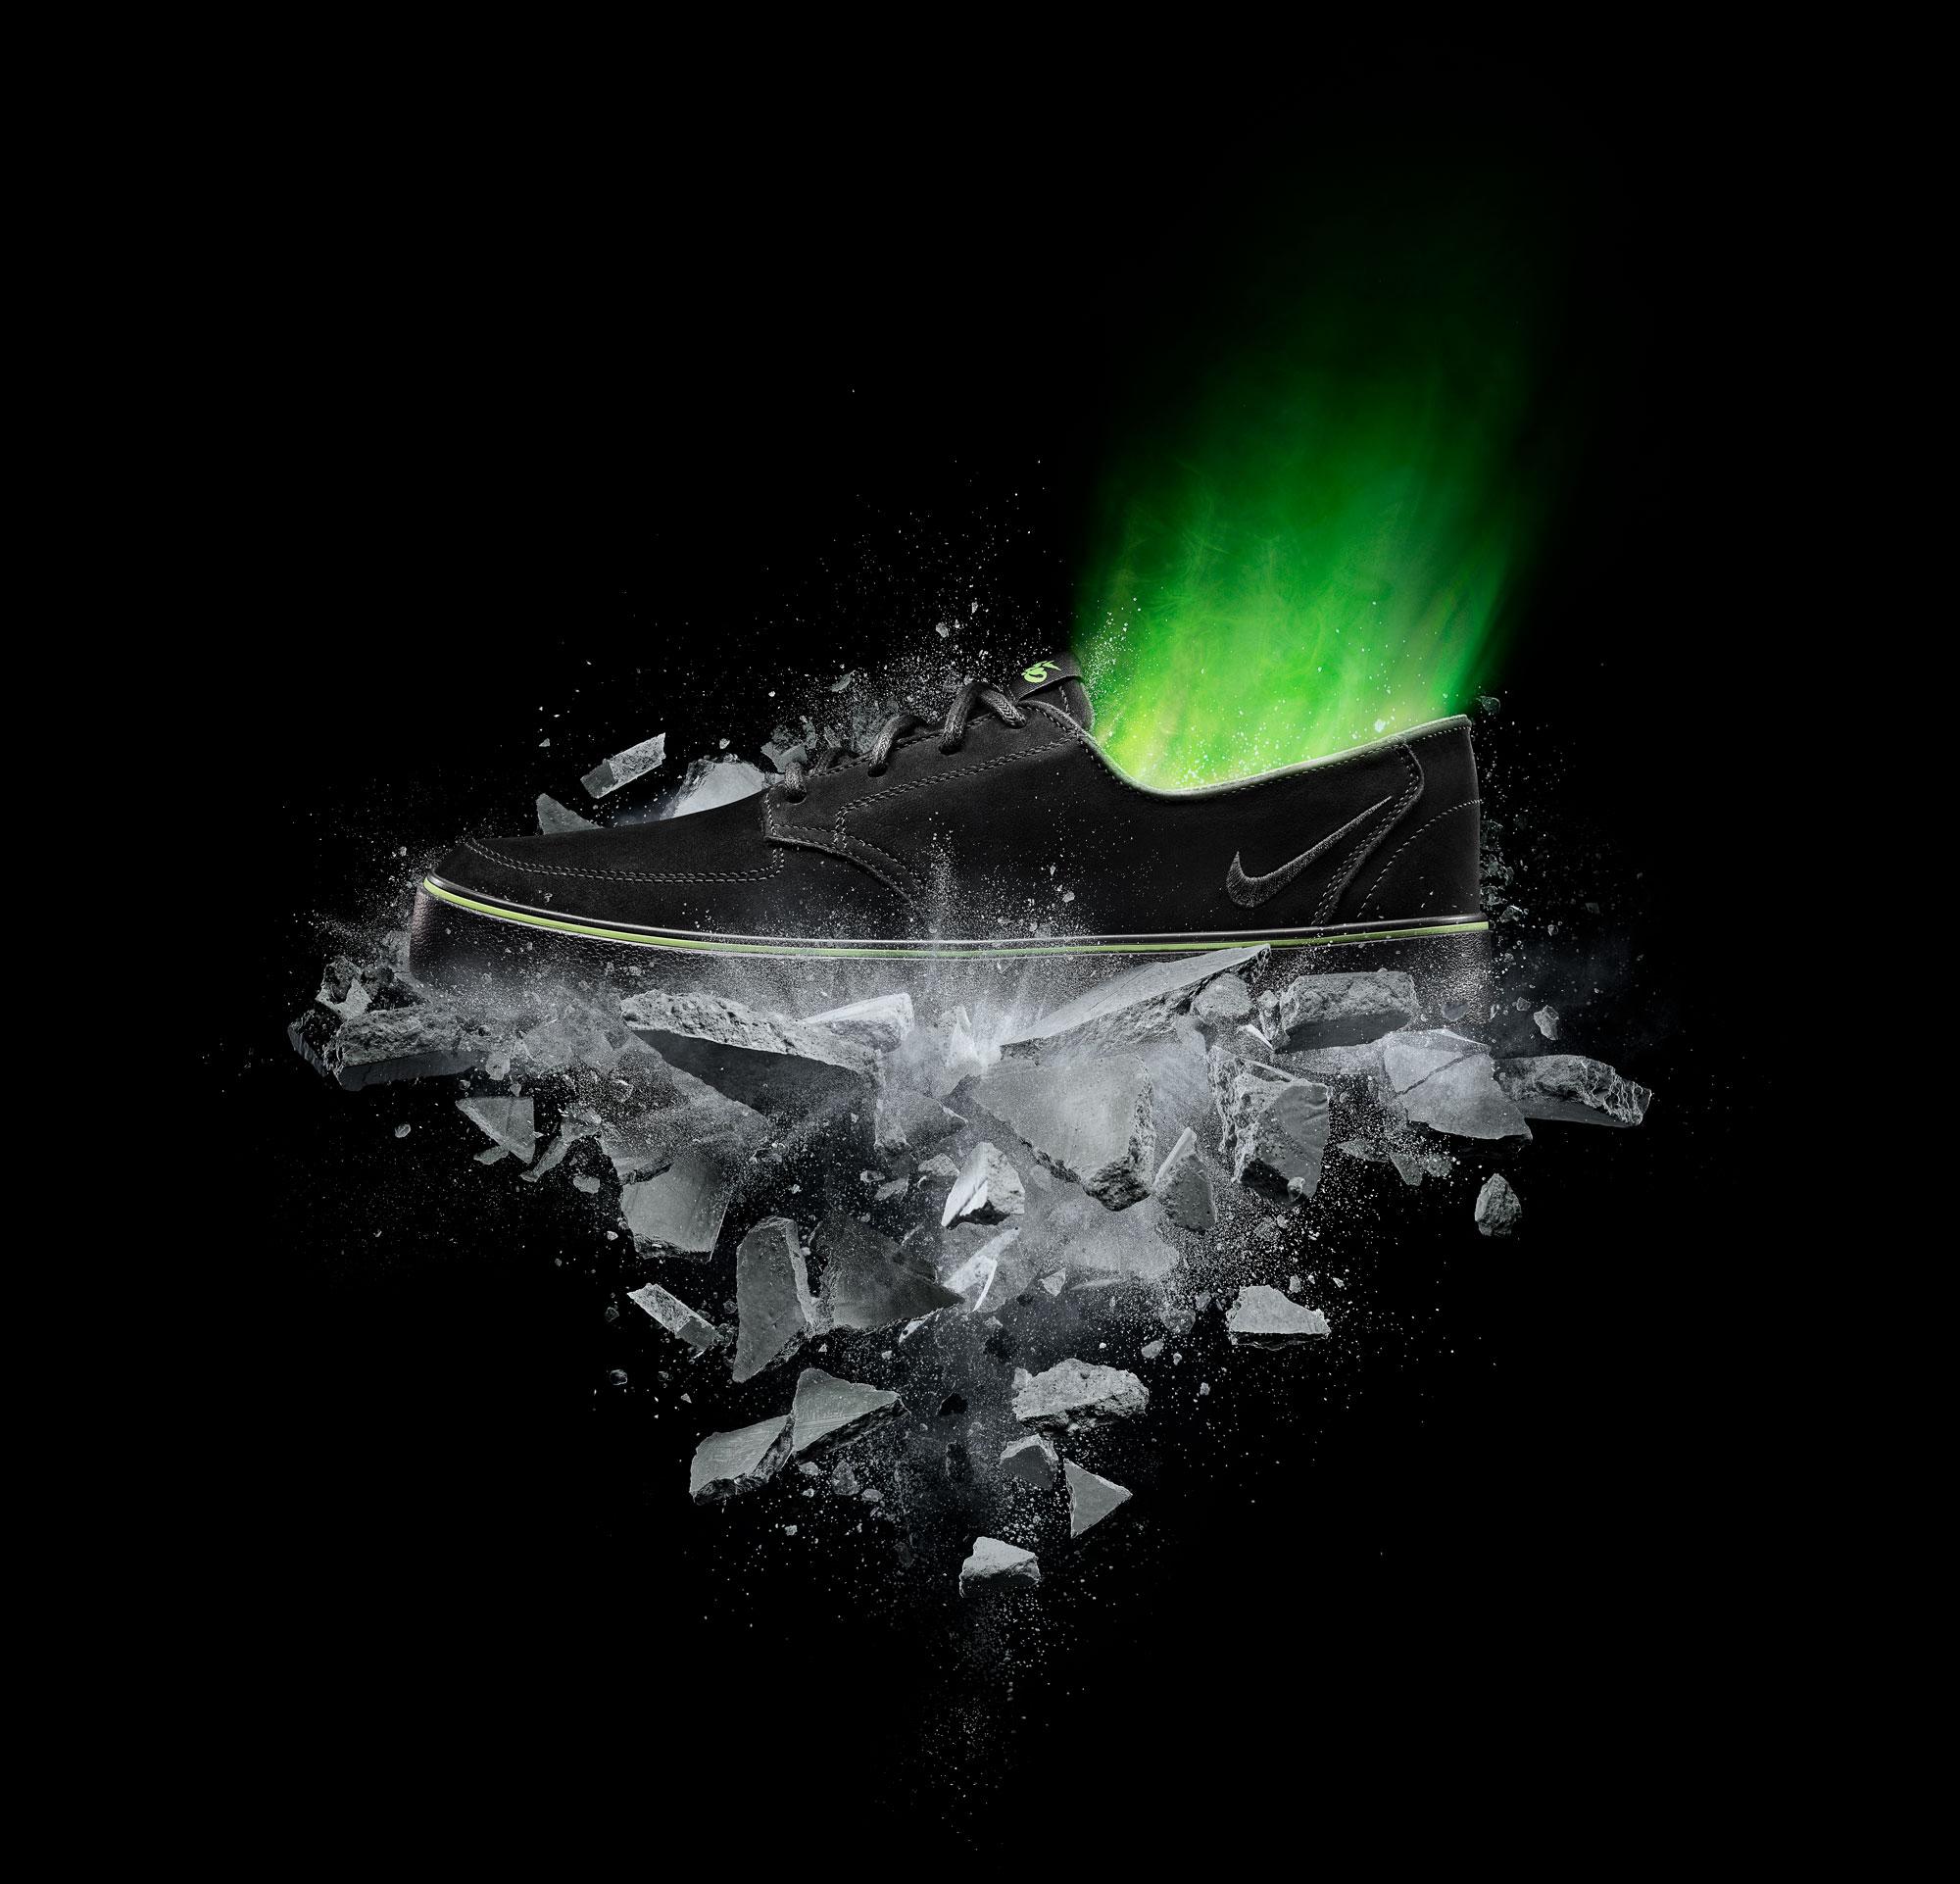 Nike6.0_Braata_Midsole.jpg